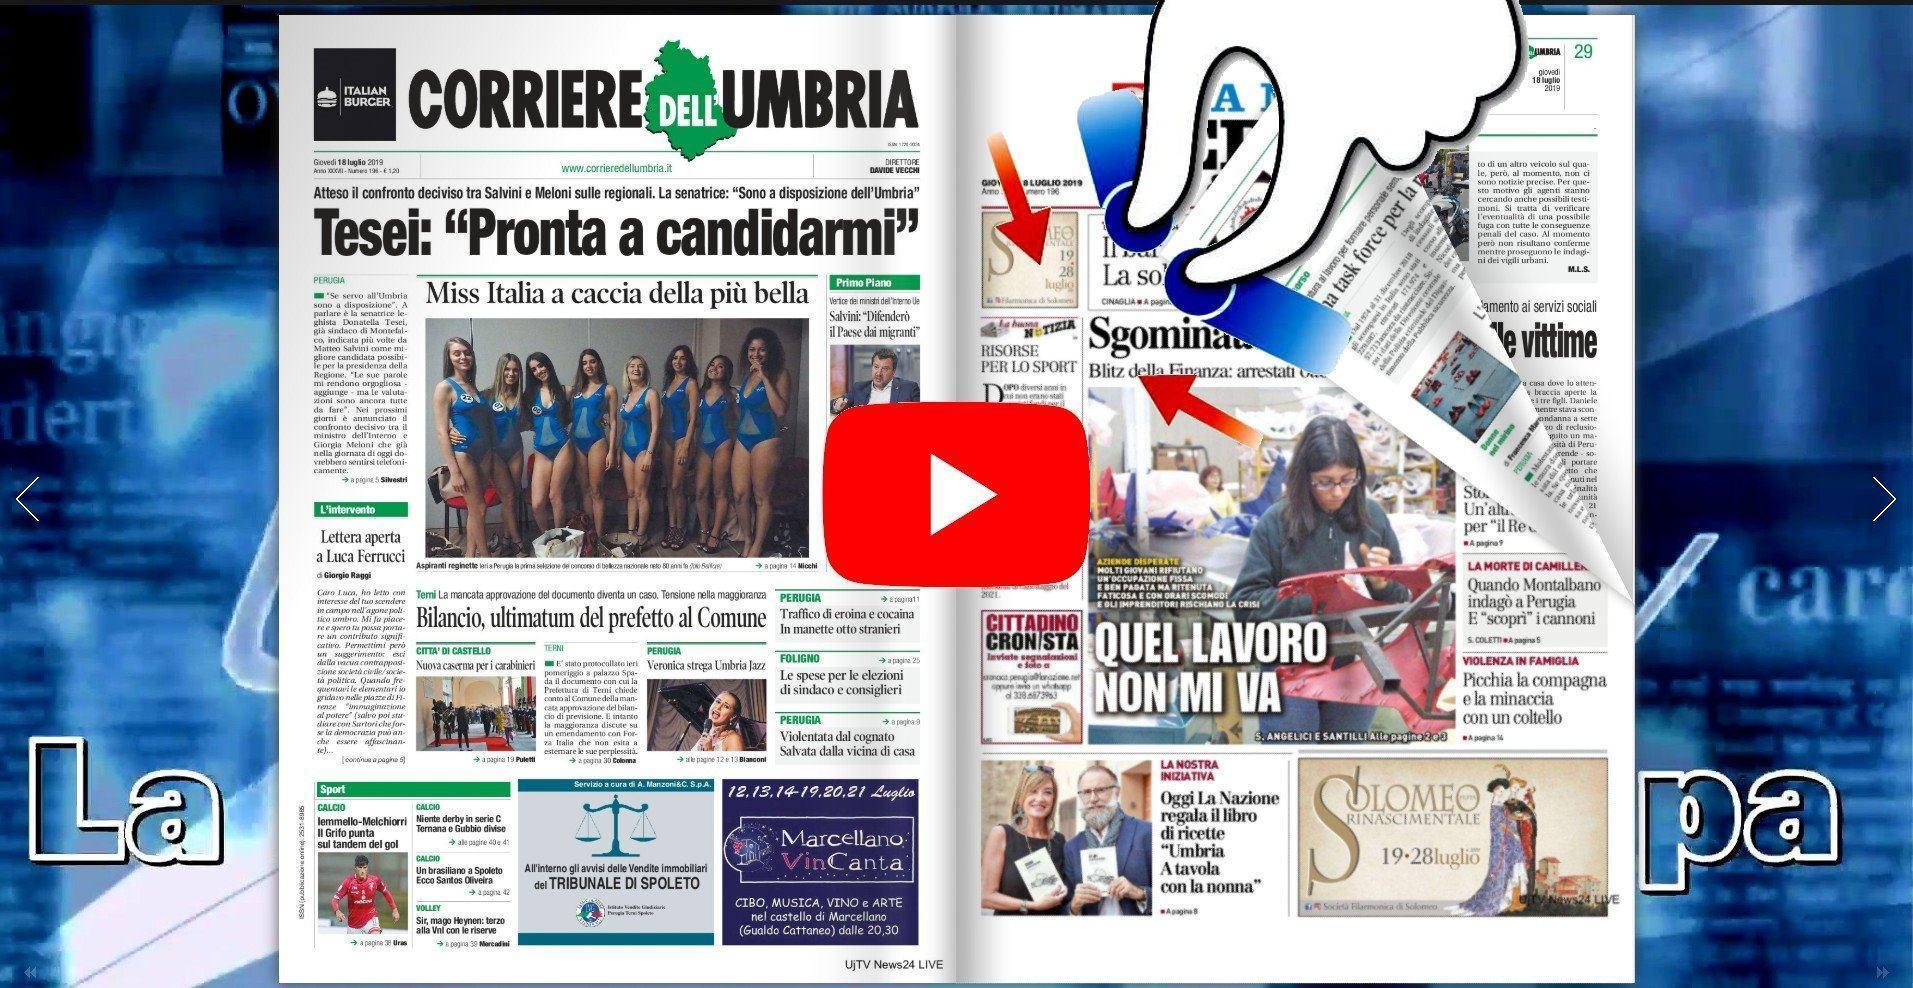 Rassegna stampa dell'Umbria giovedì 18 luglio 2019 UjTV News24 LIVE